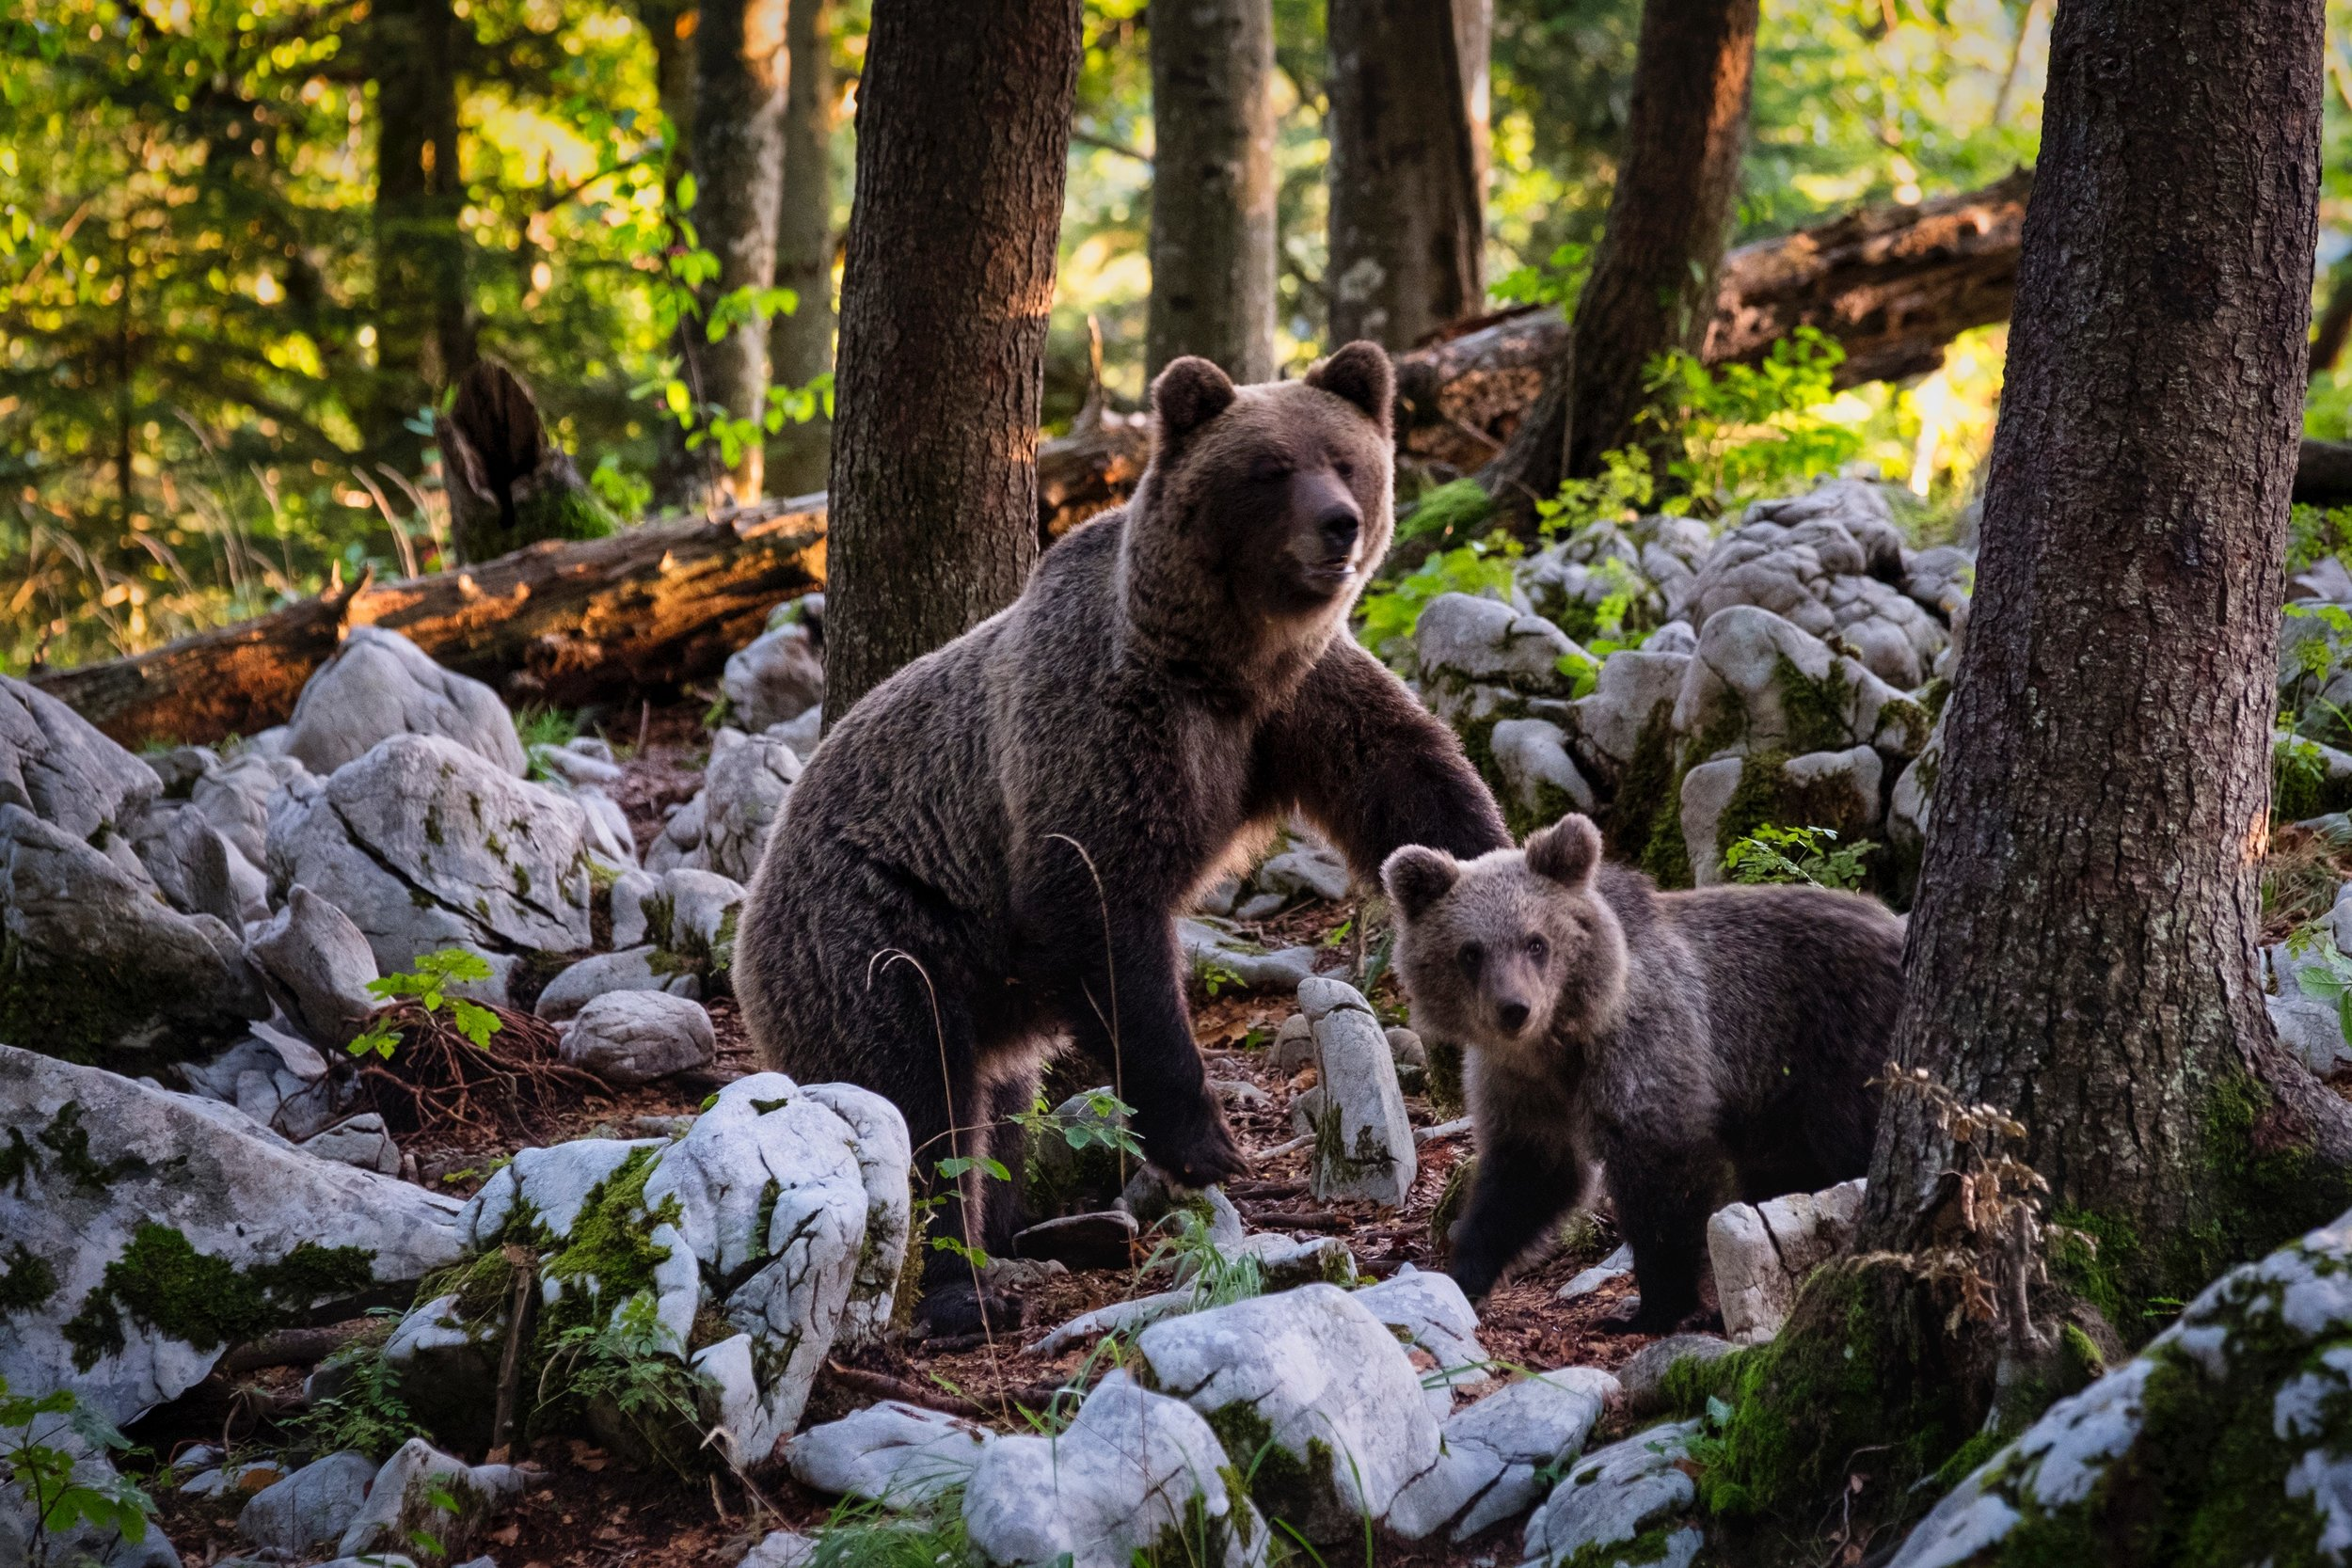 mother bear rising